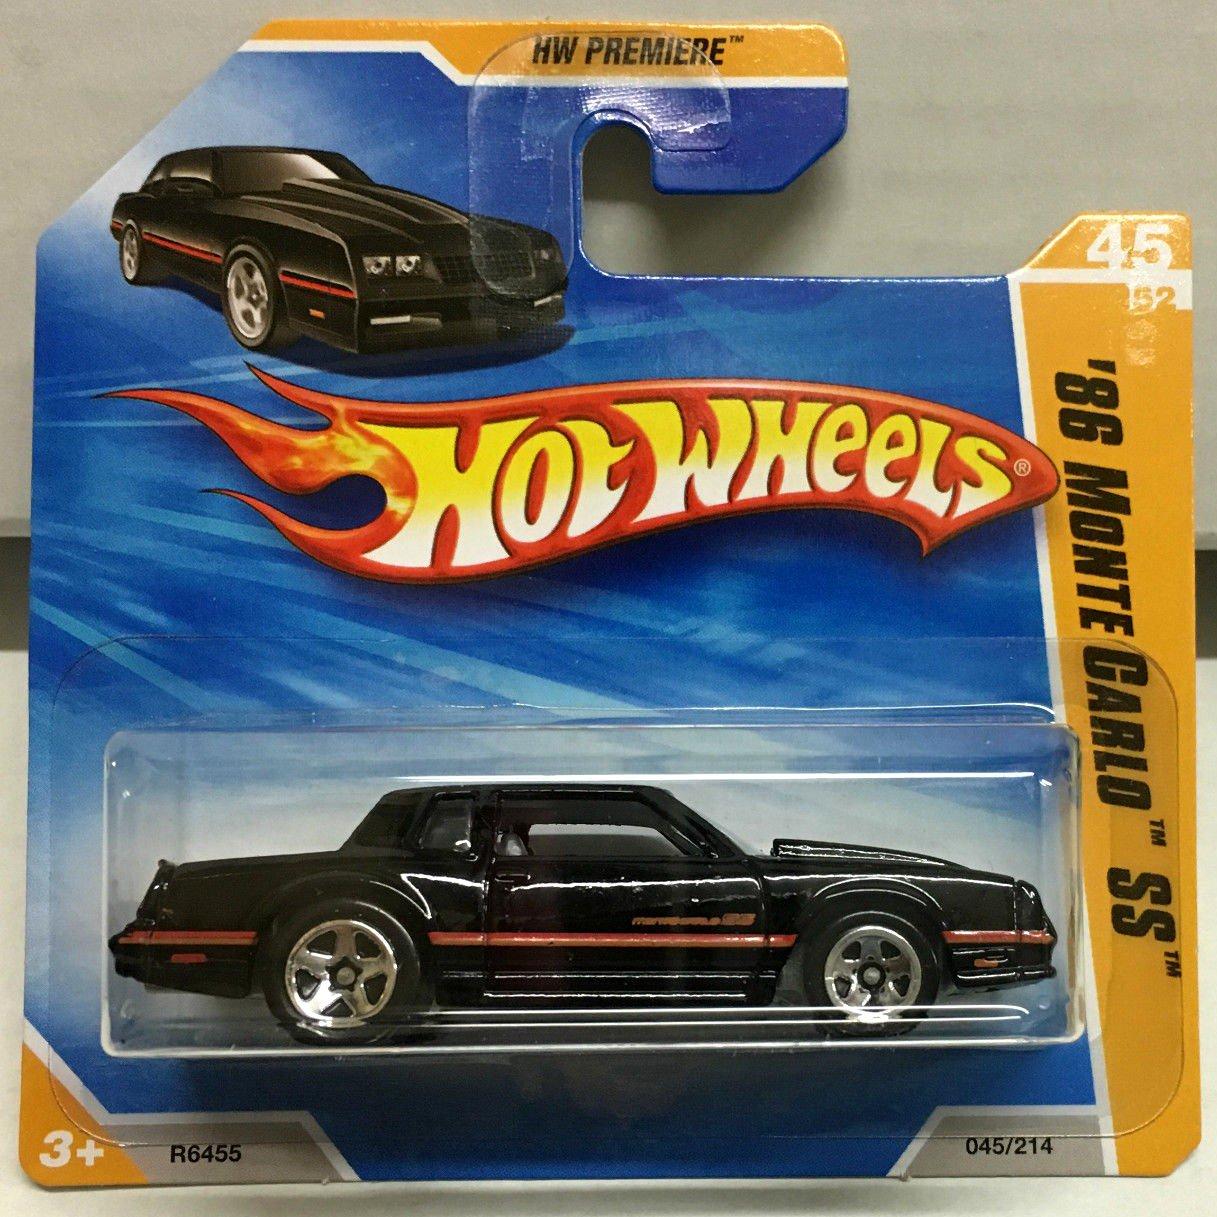 39 86 monte carlo ss 45 black 2010 hot wheels. Black Bedroom Furniture Sets. Home Design Ideas